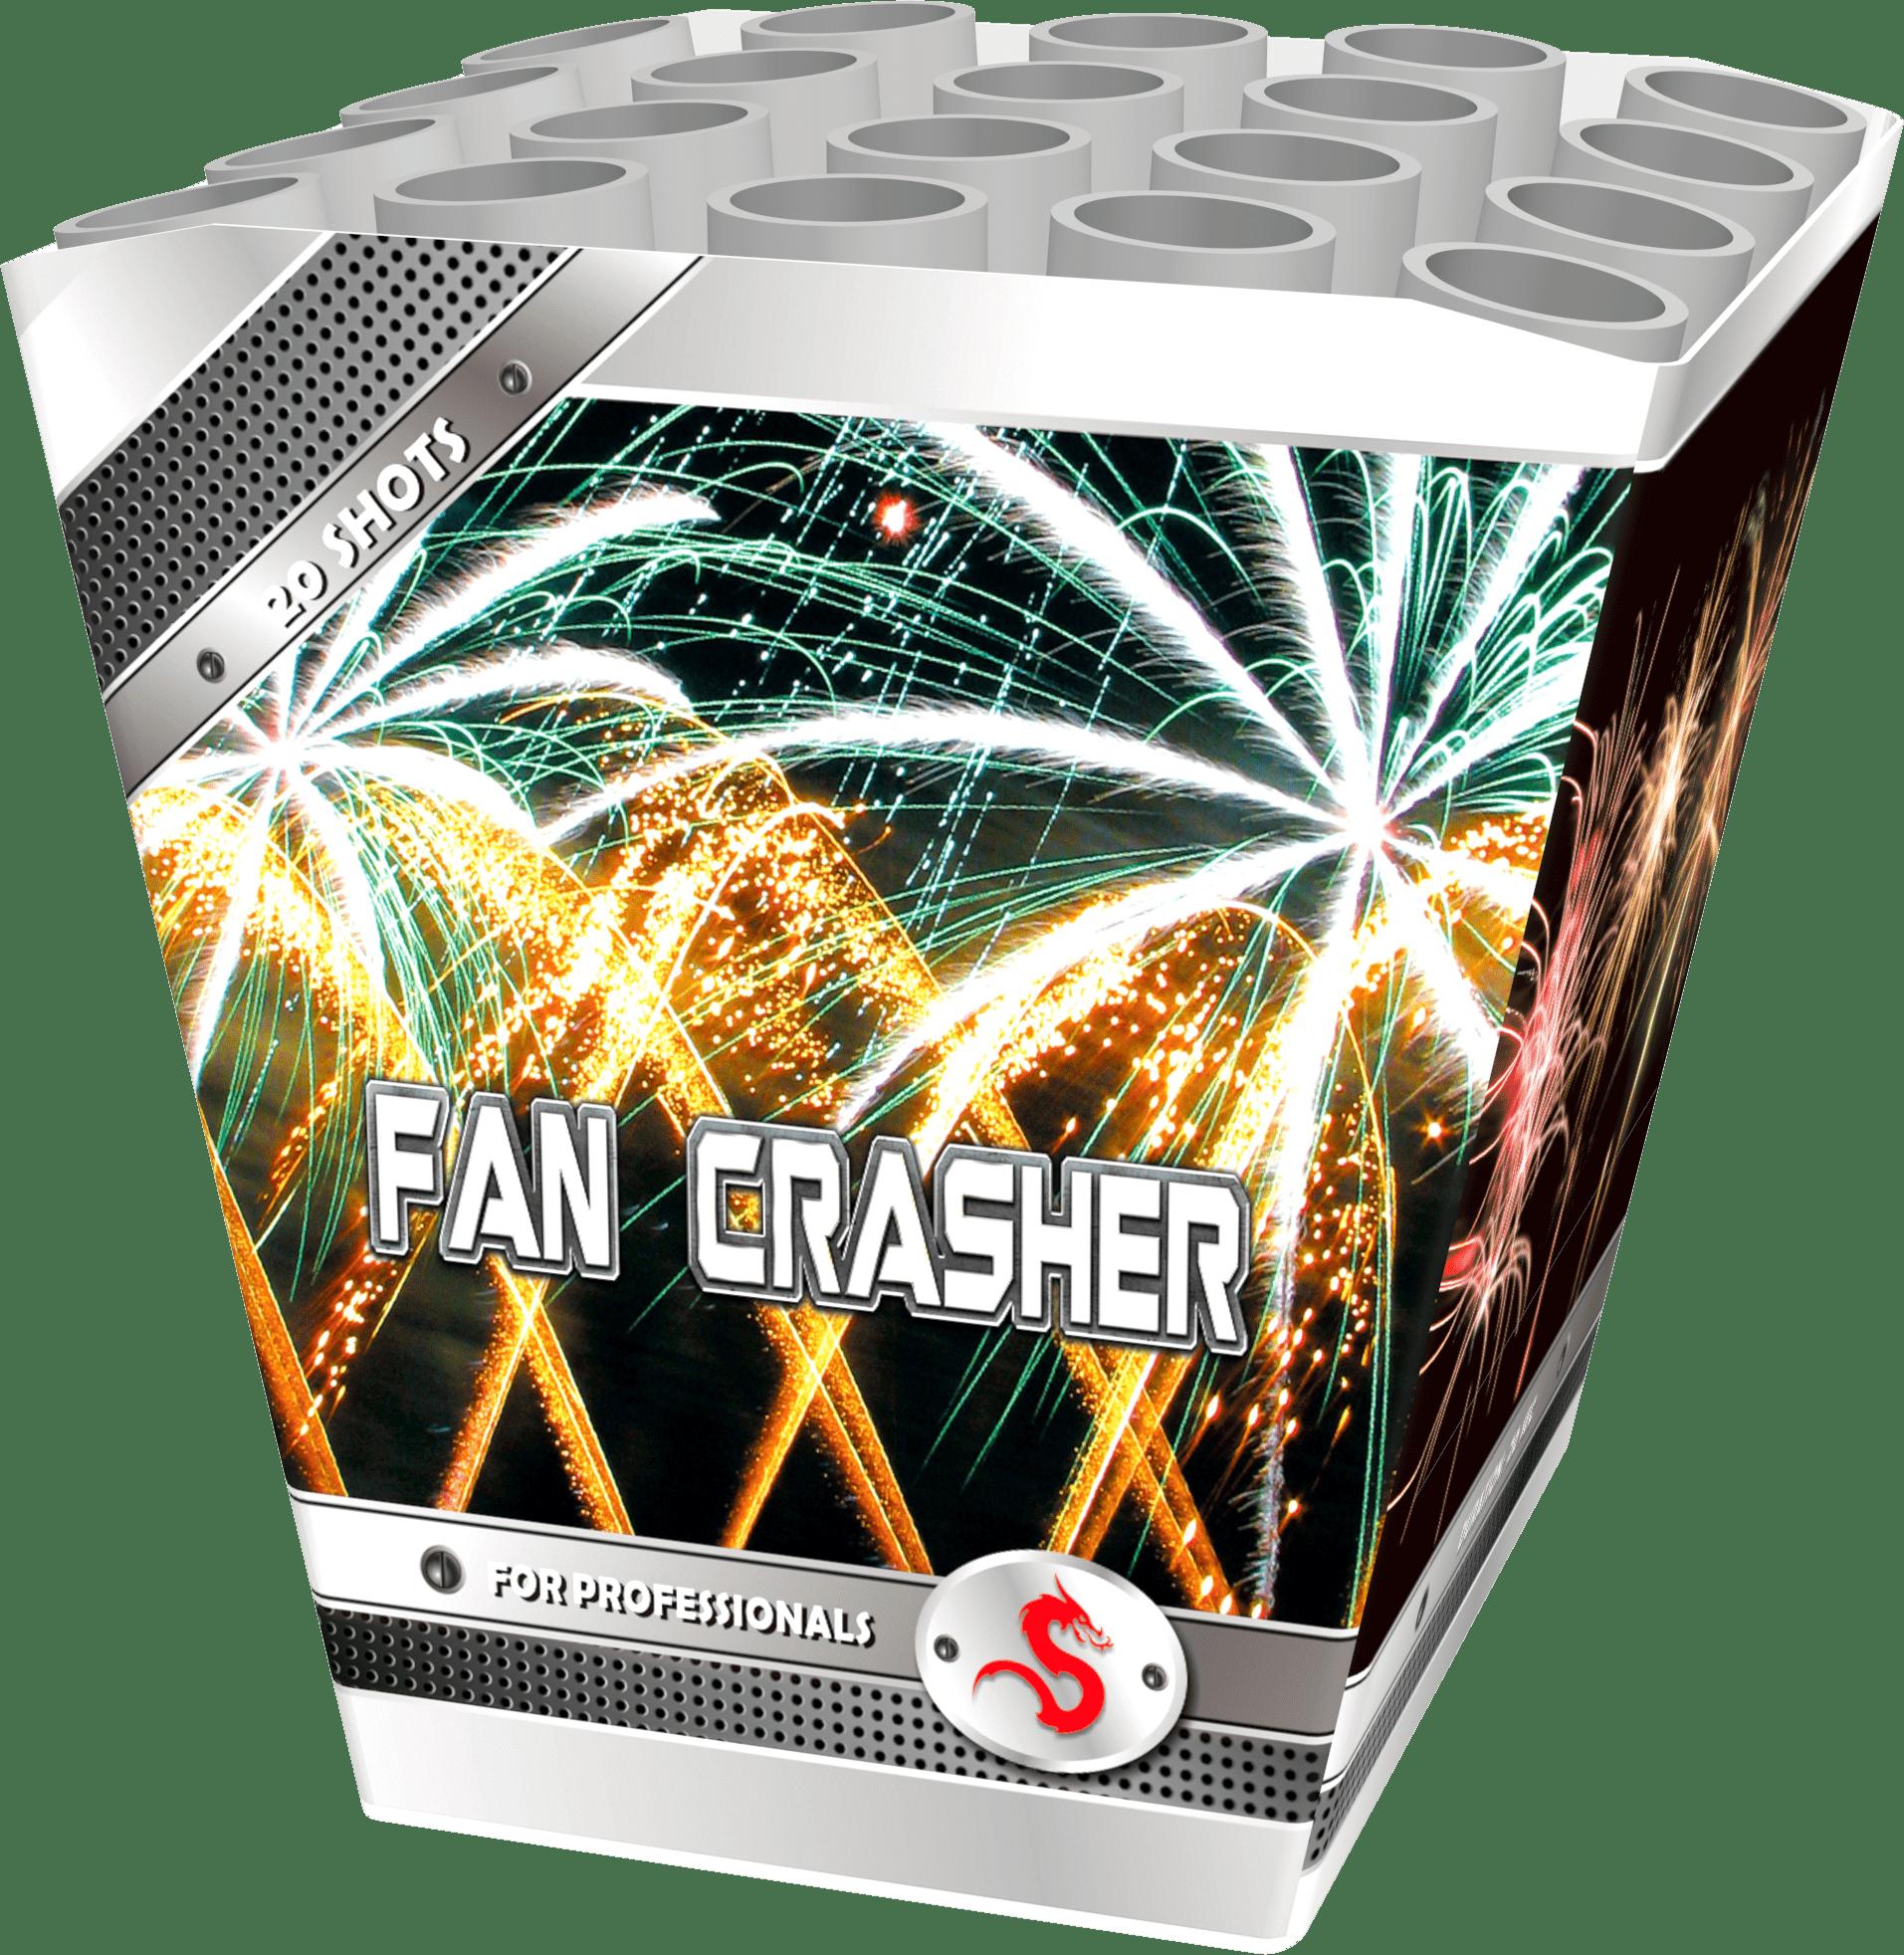 Fan Crasher 2 halen = 1 betalen